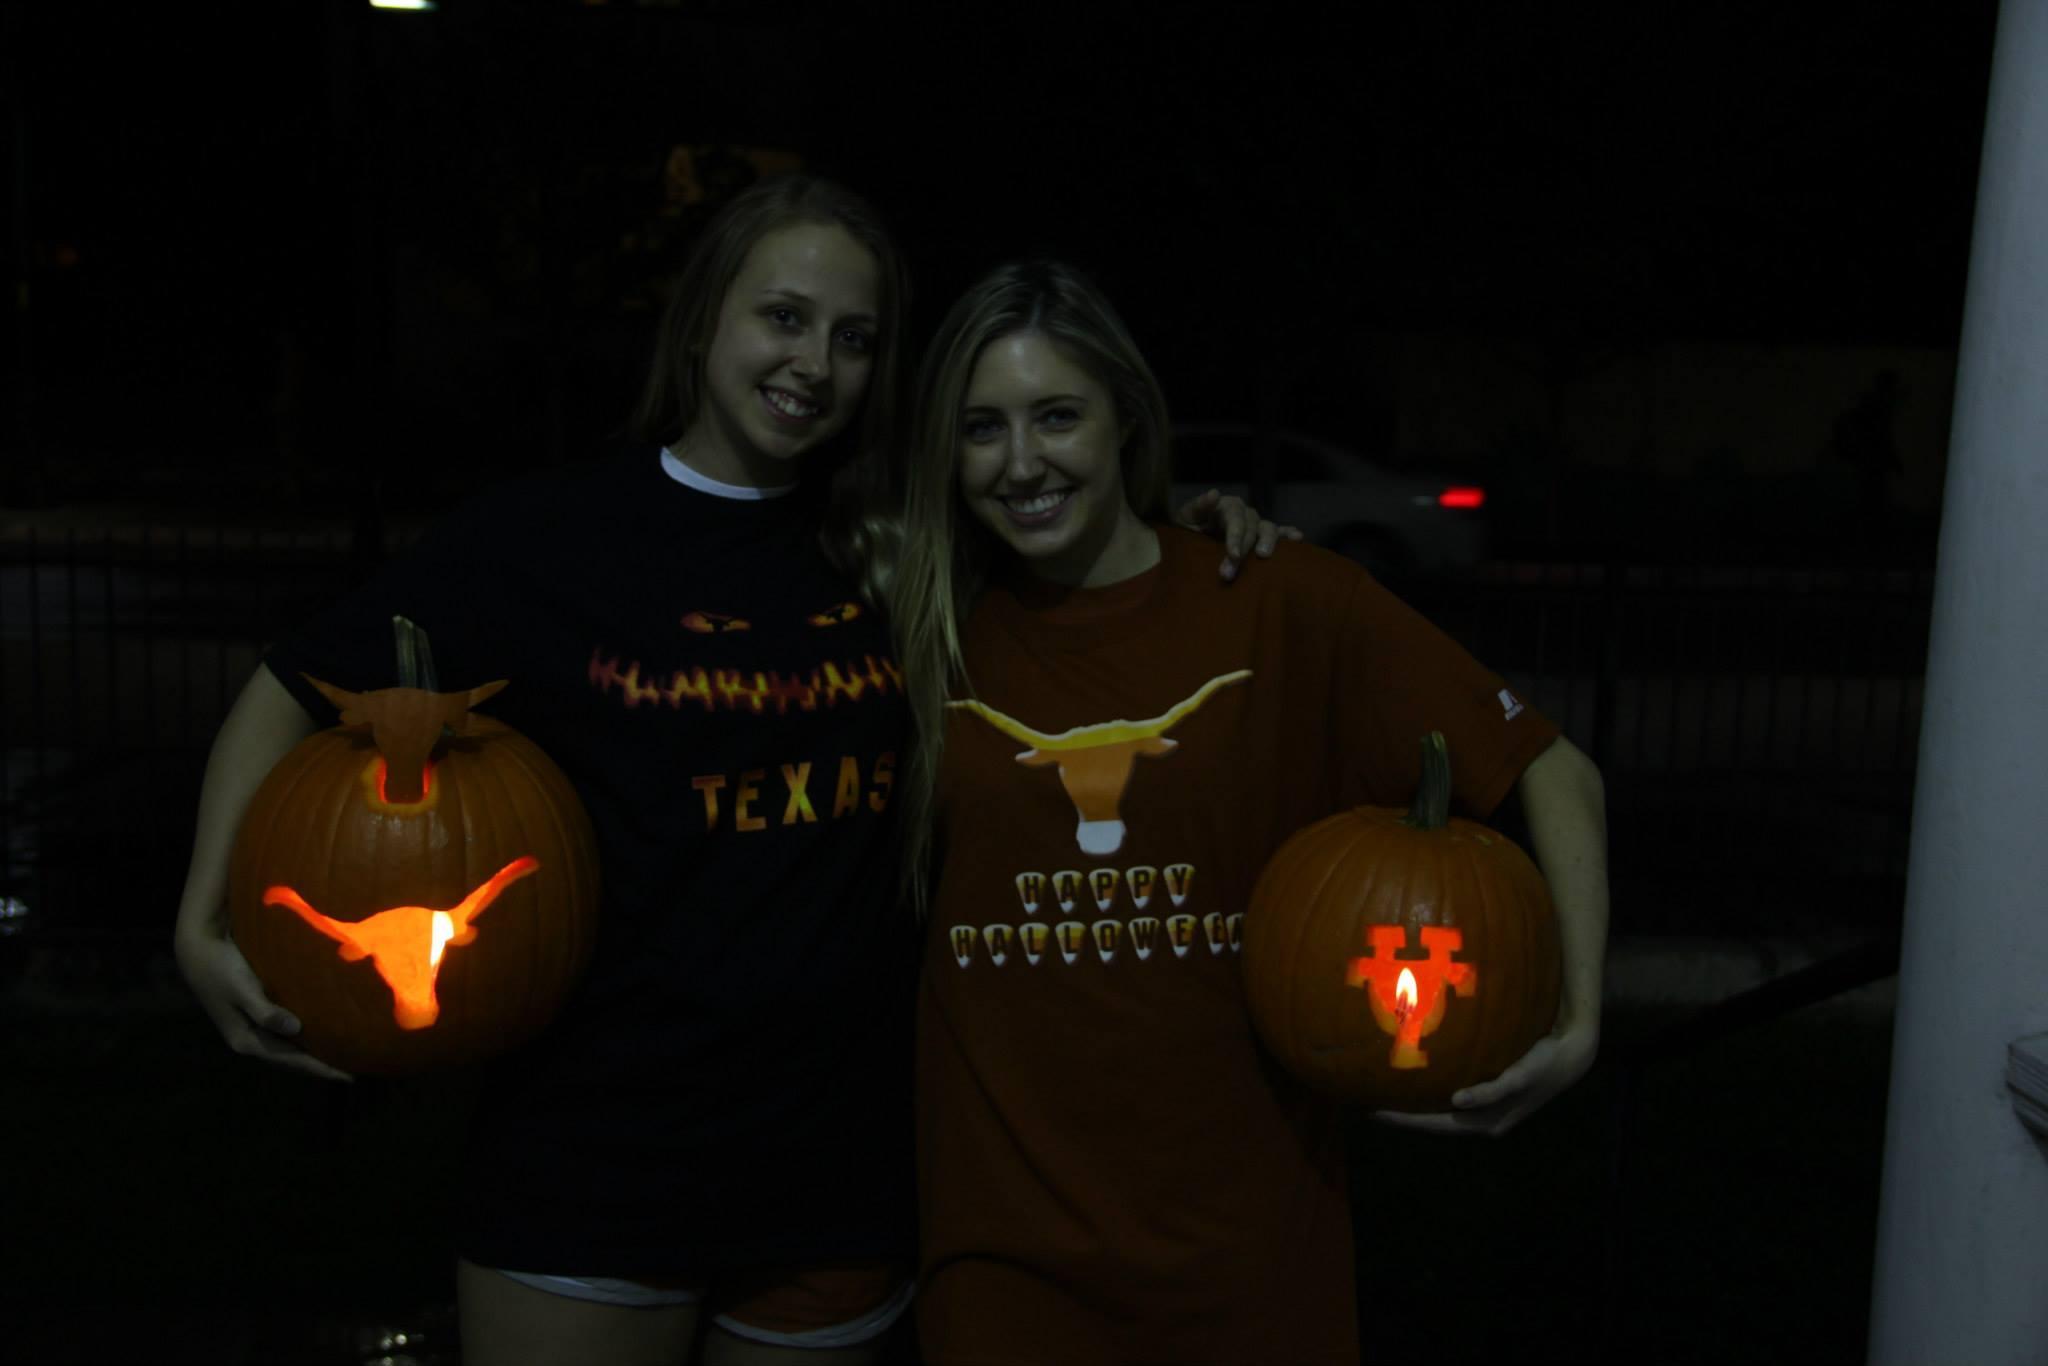 Texas Longhorn halloween